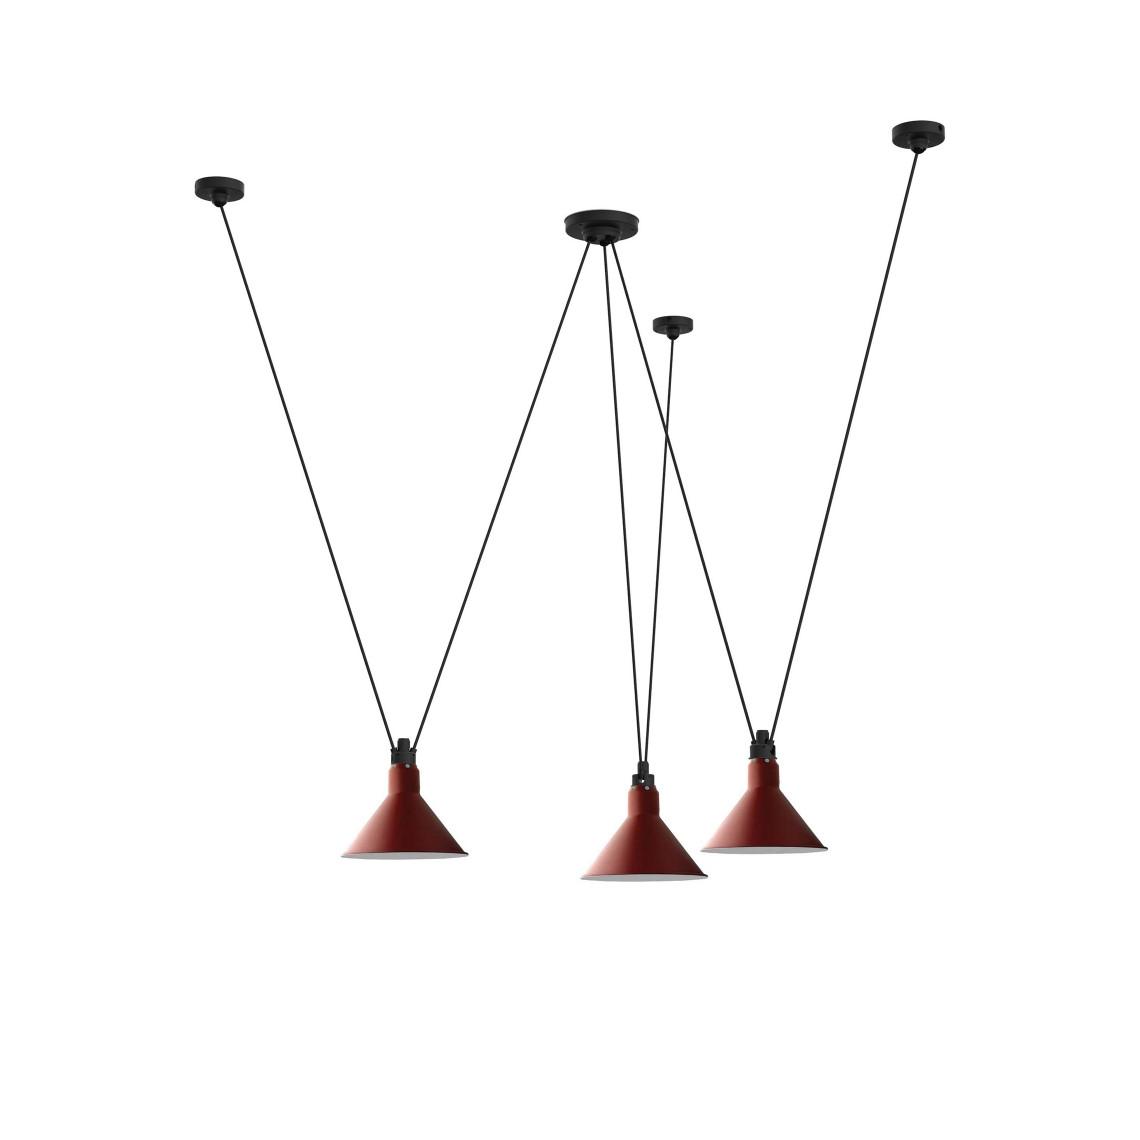 Les Acrobates de Gras No 325 - Conic L Red